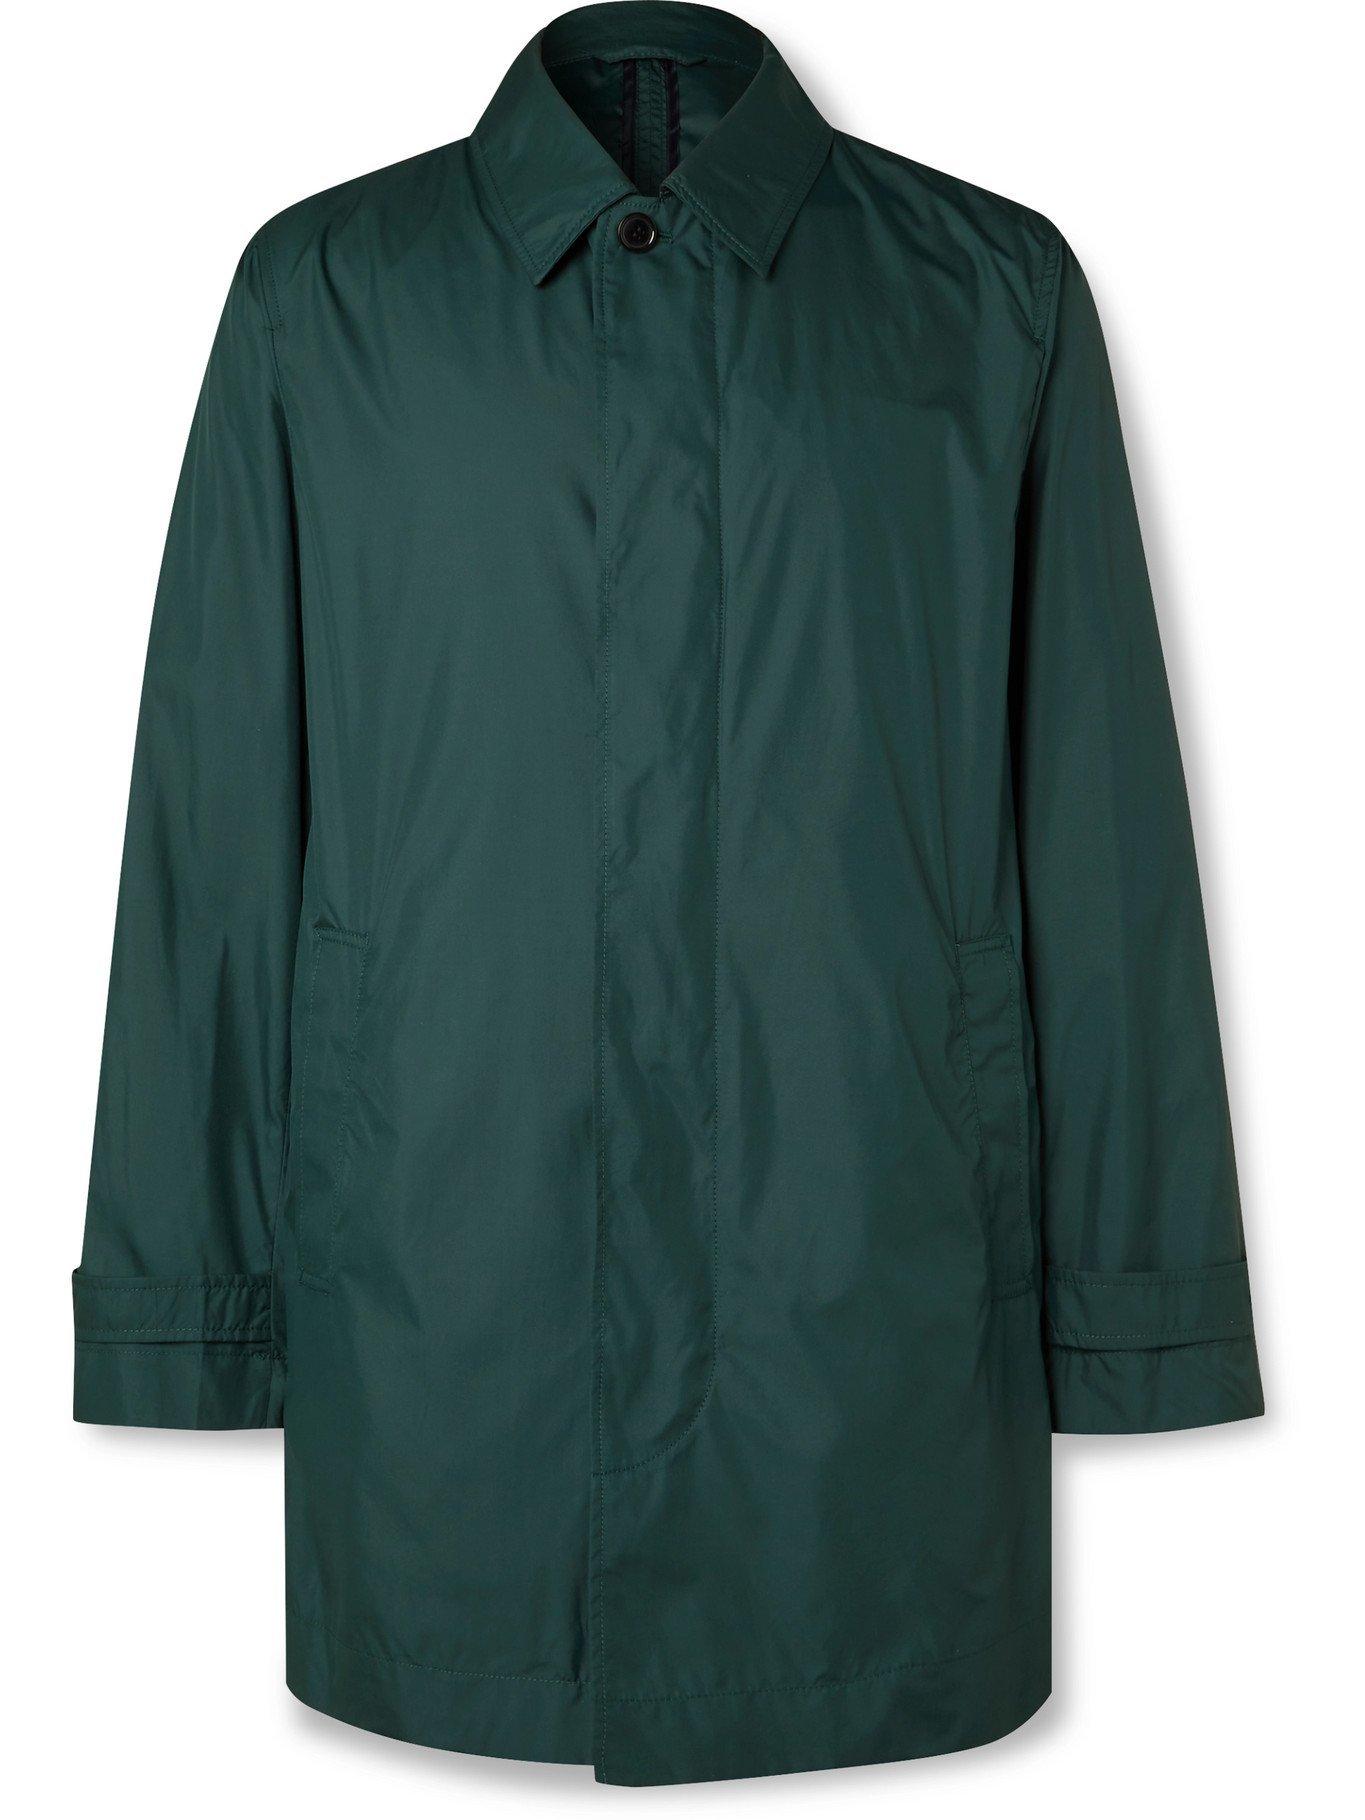 Photo: SUNSPEL - Paul Weller Recycled Shell Raincoat - Green